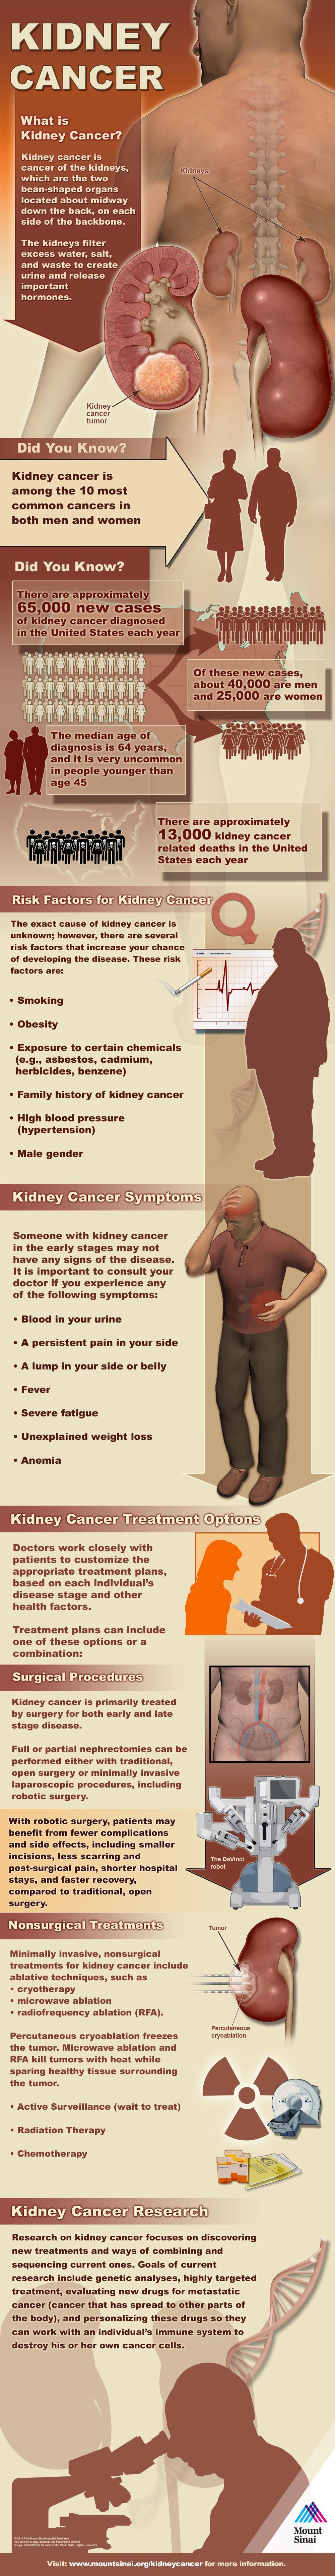 kidney ccancer